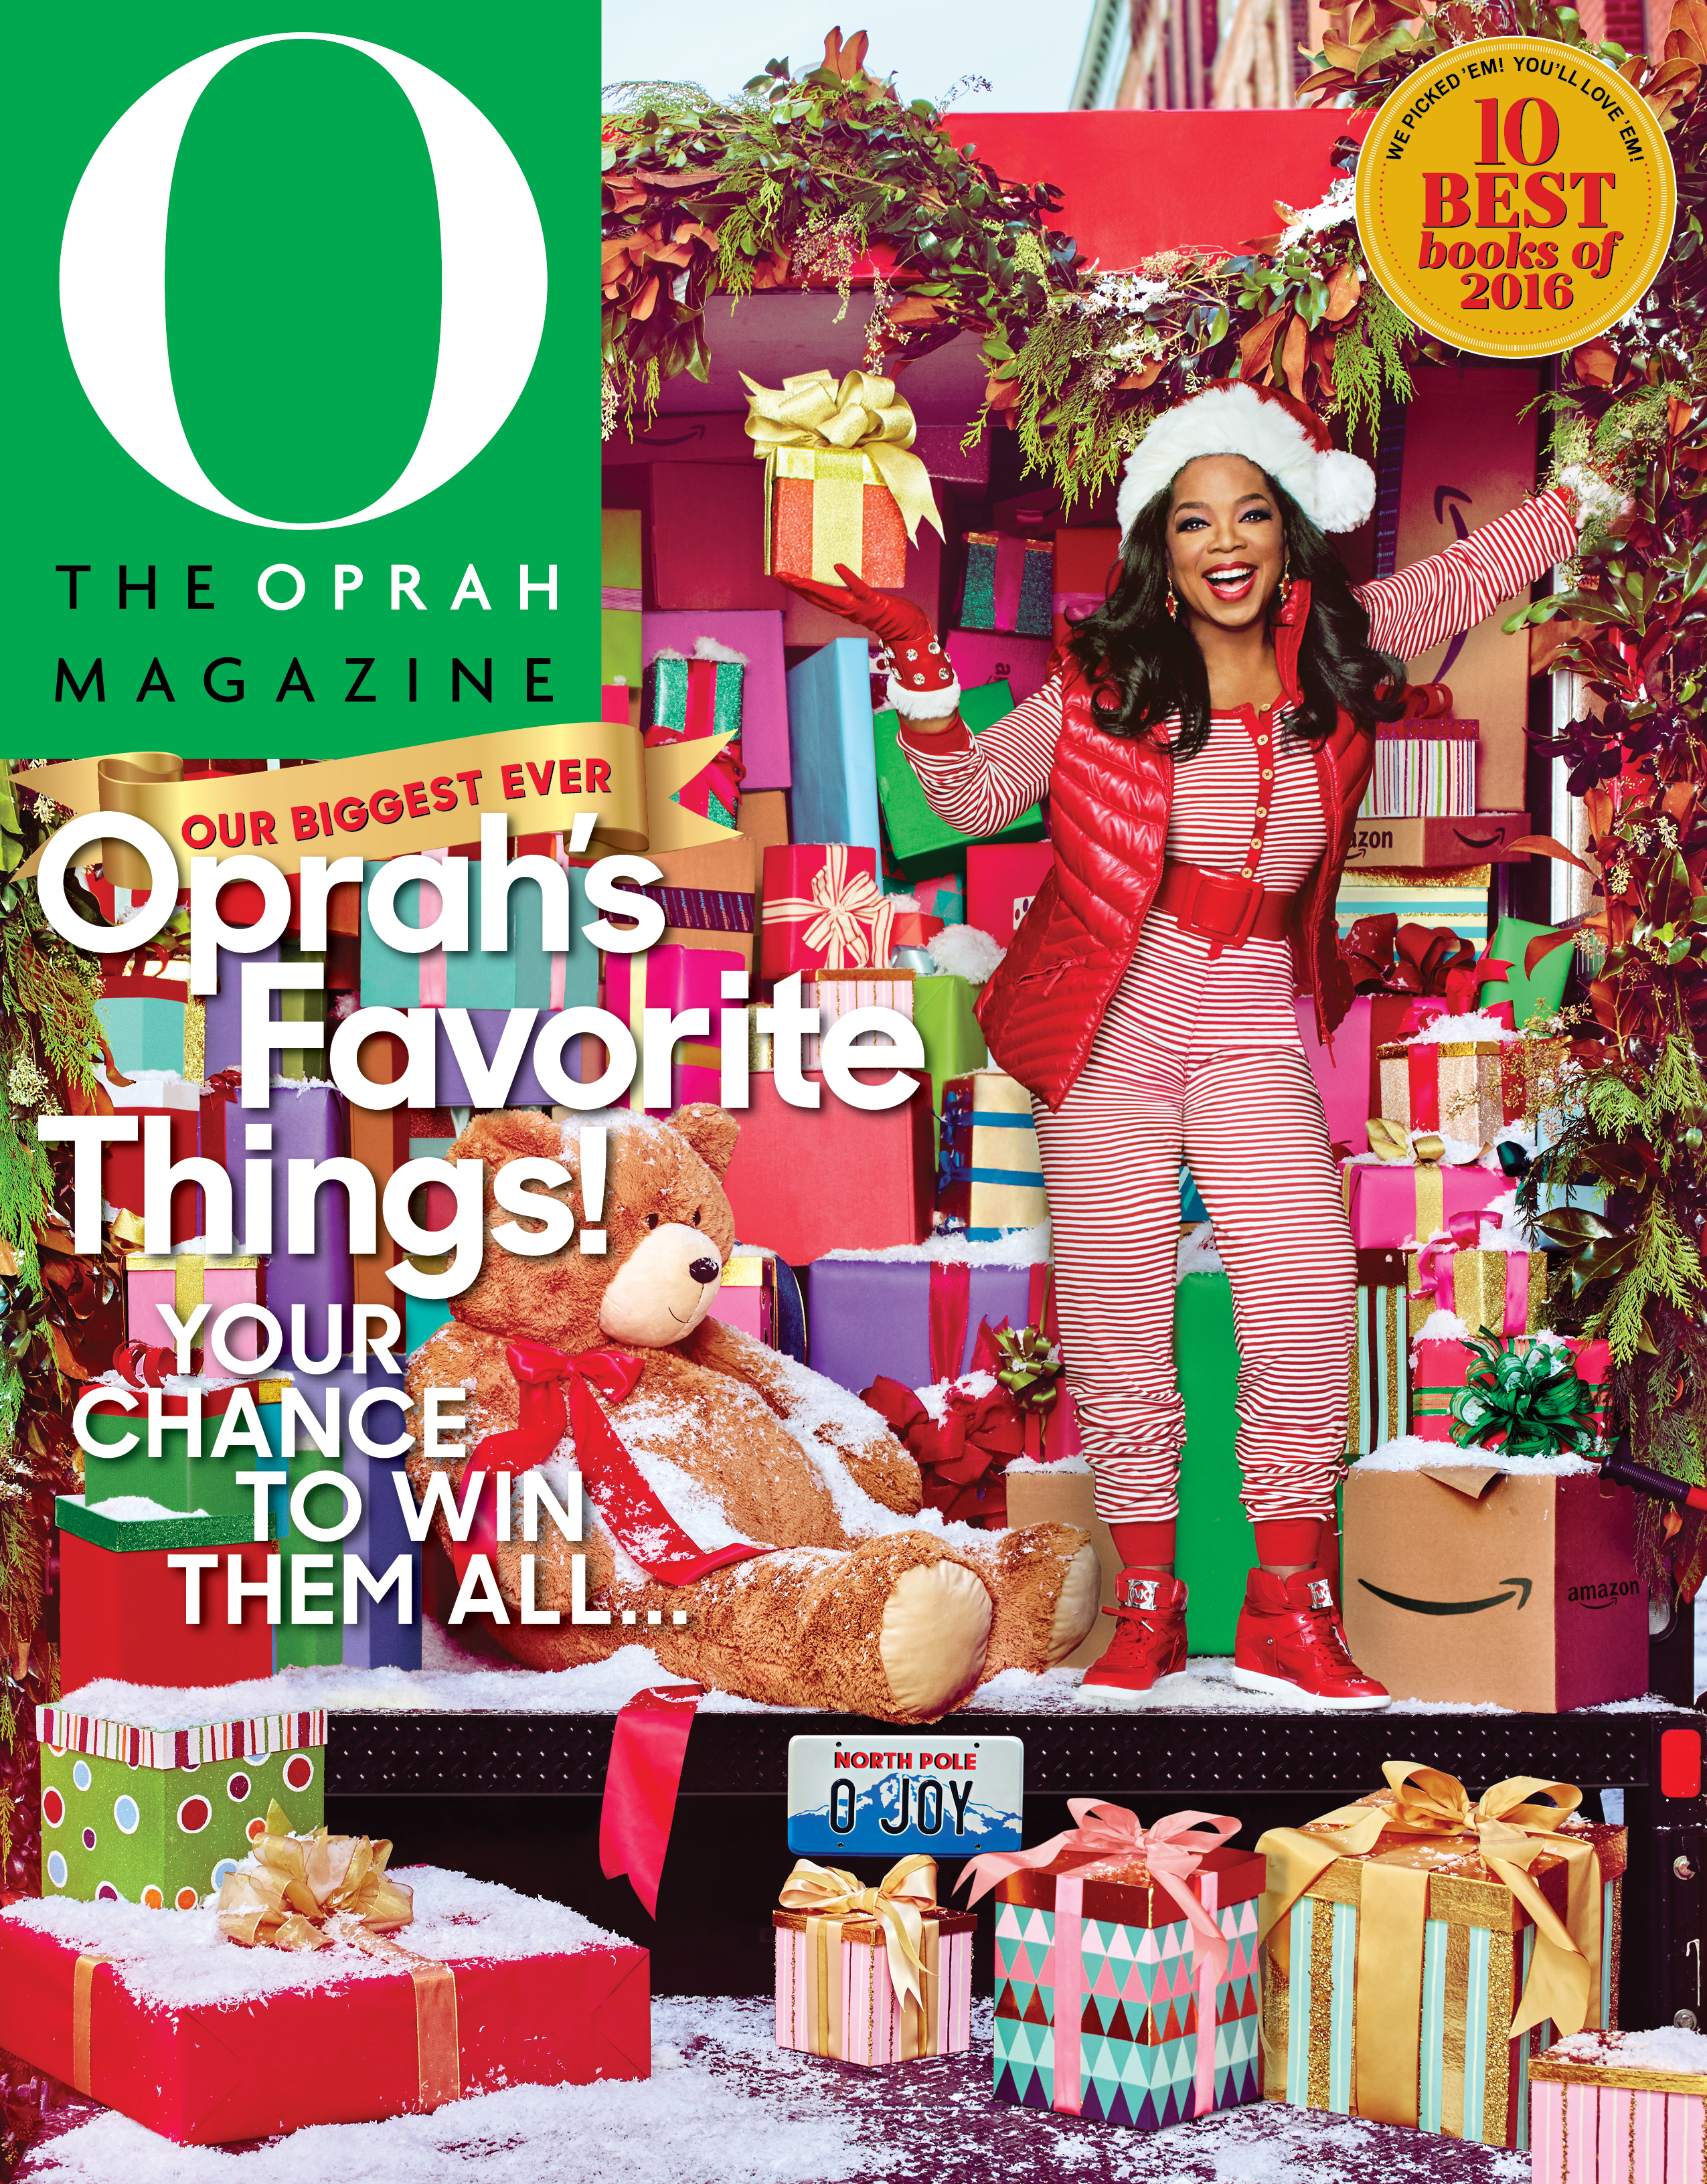 6 Piece NO SALT Spice Rub Collection - An Oprah's Favorite